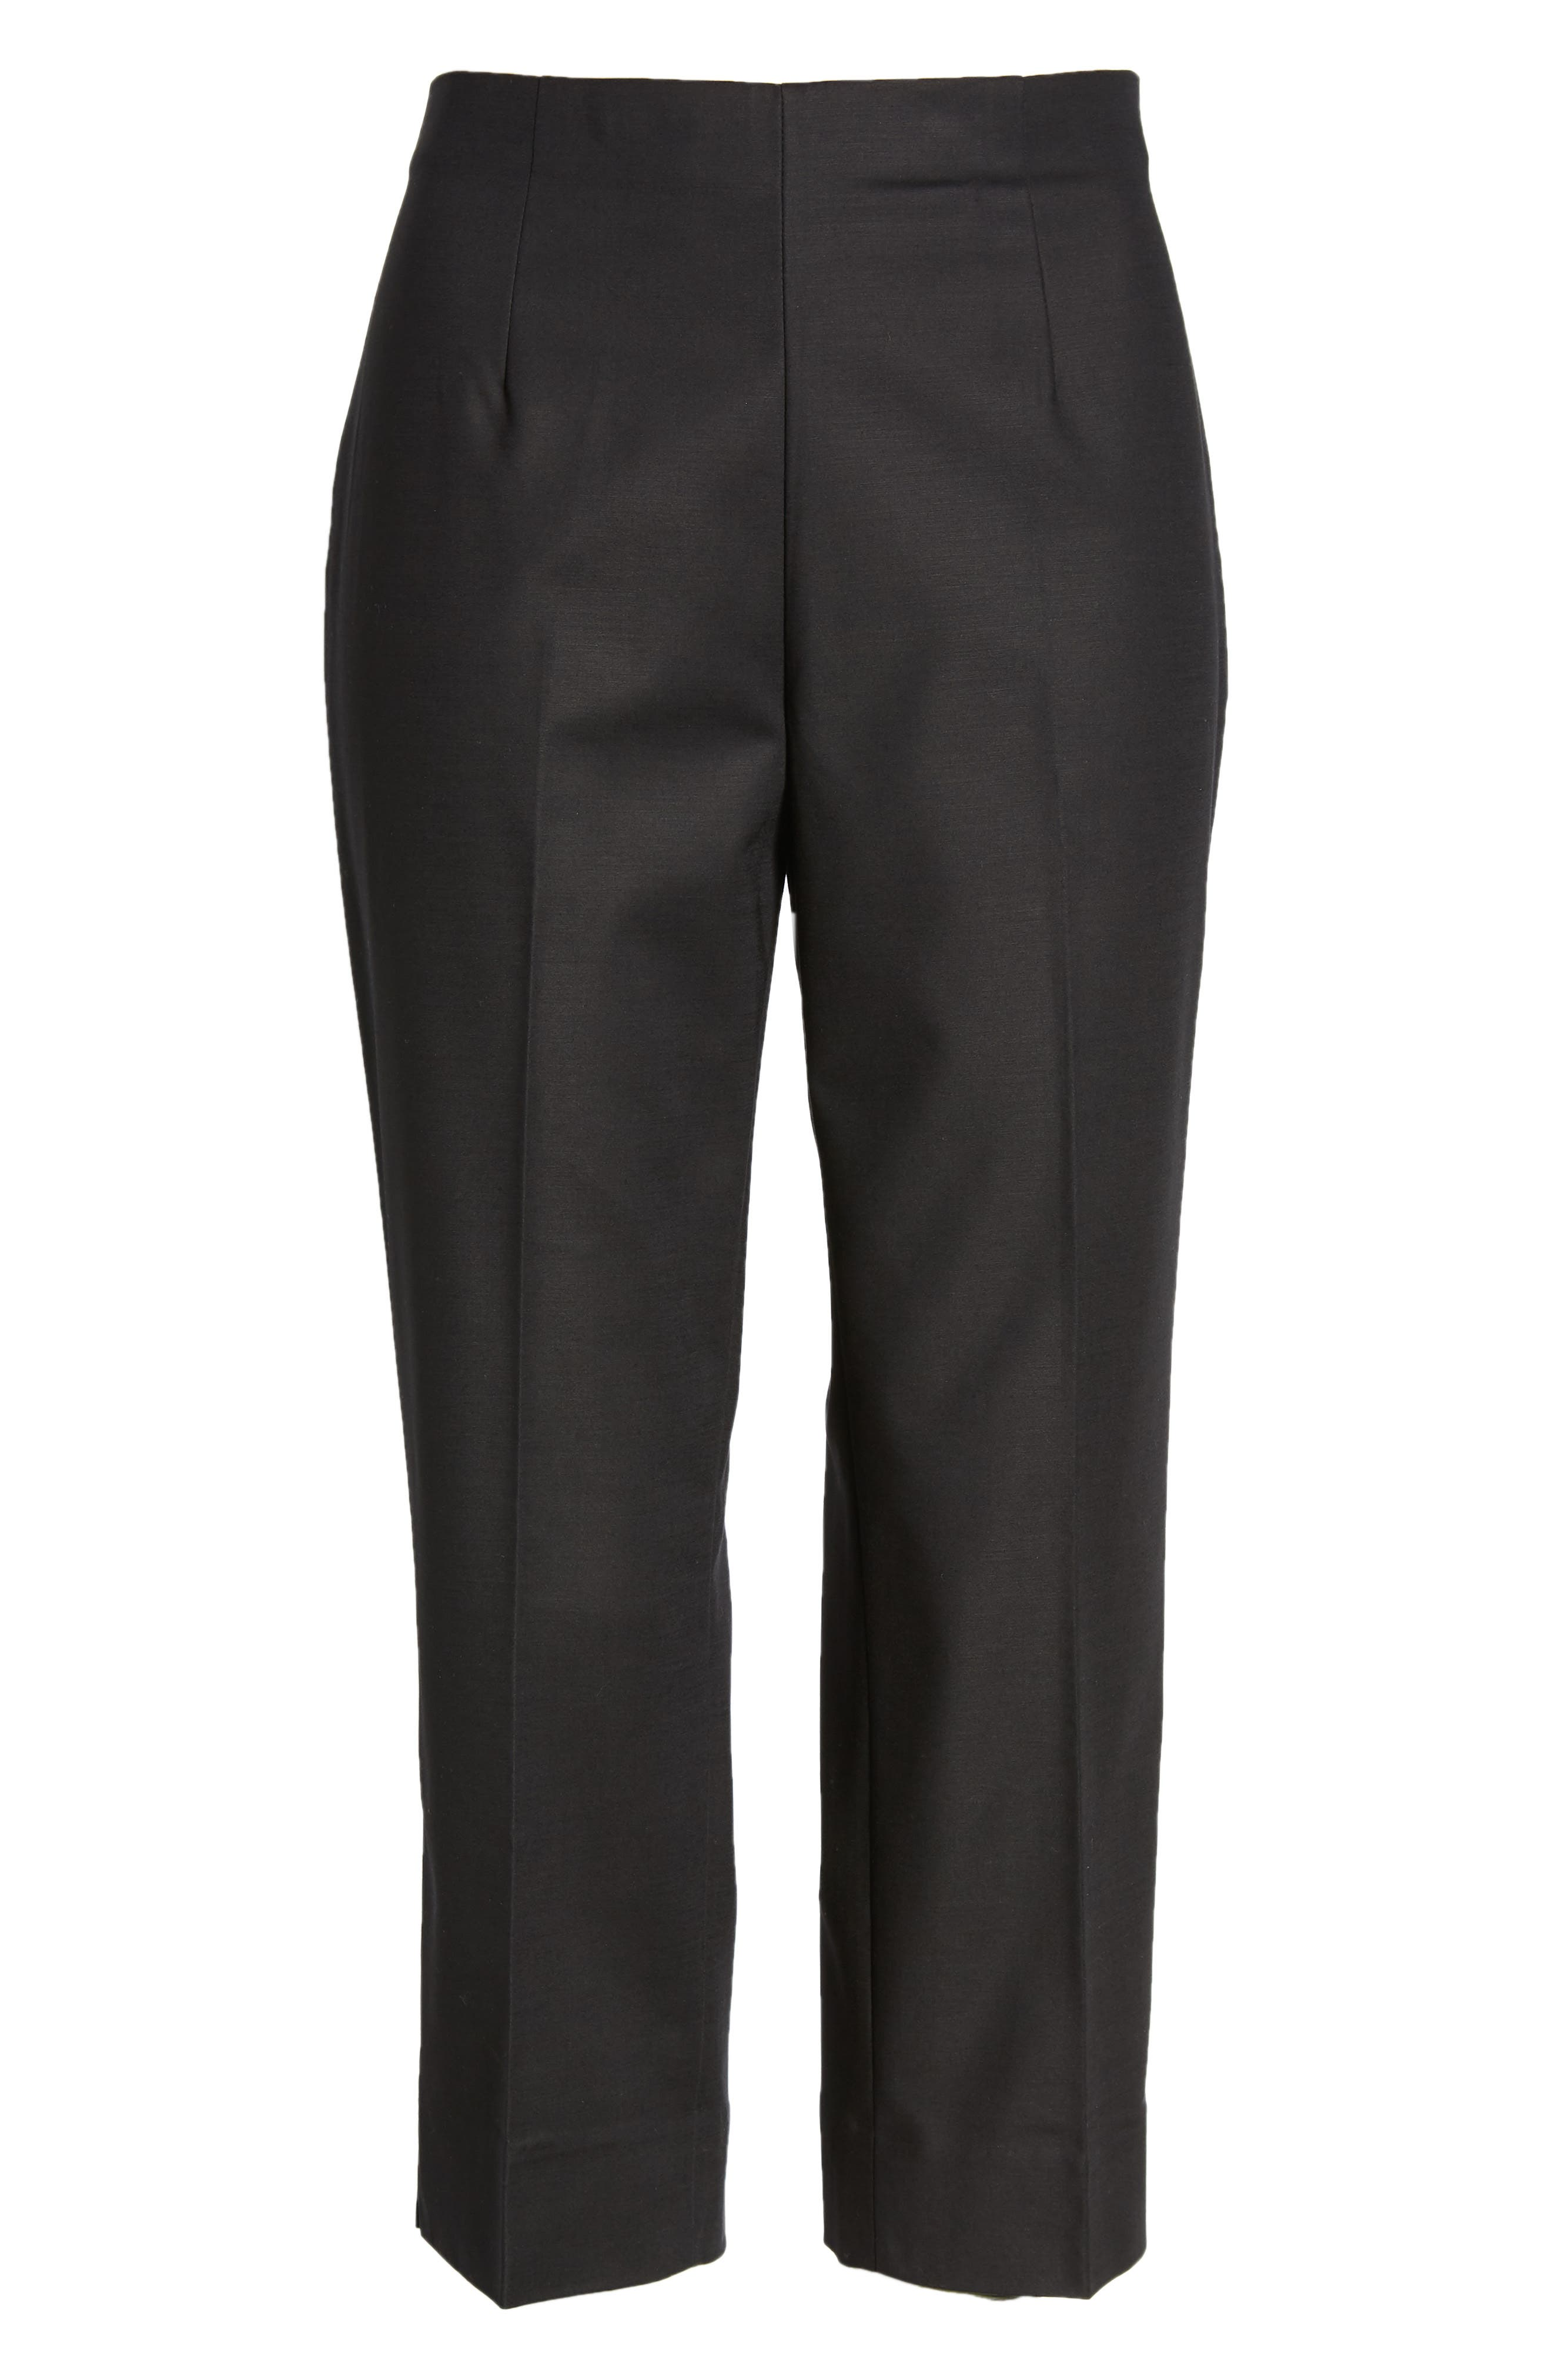 NIC+ZOE,                             Perfect Side Zip Crop Pants,                             Alternate thumbnail 6, color,                             BLACK ONYX